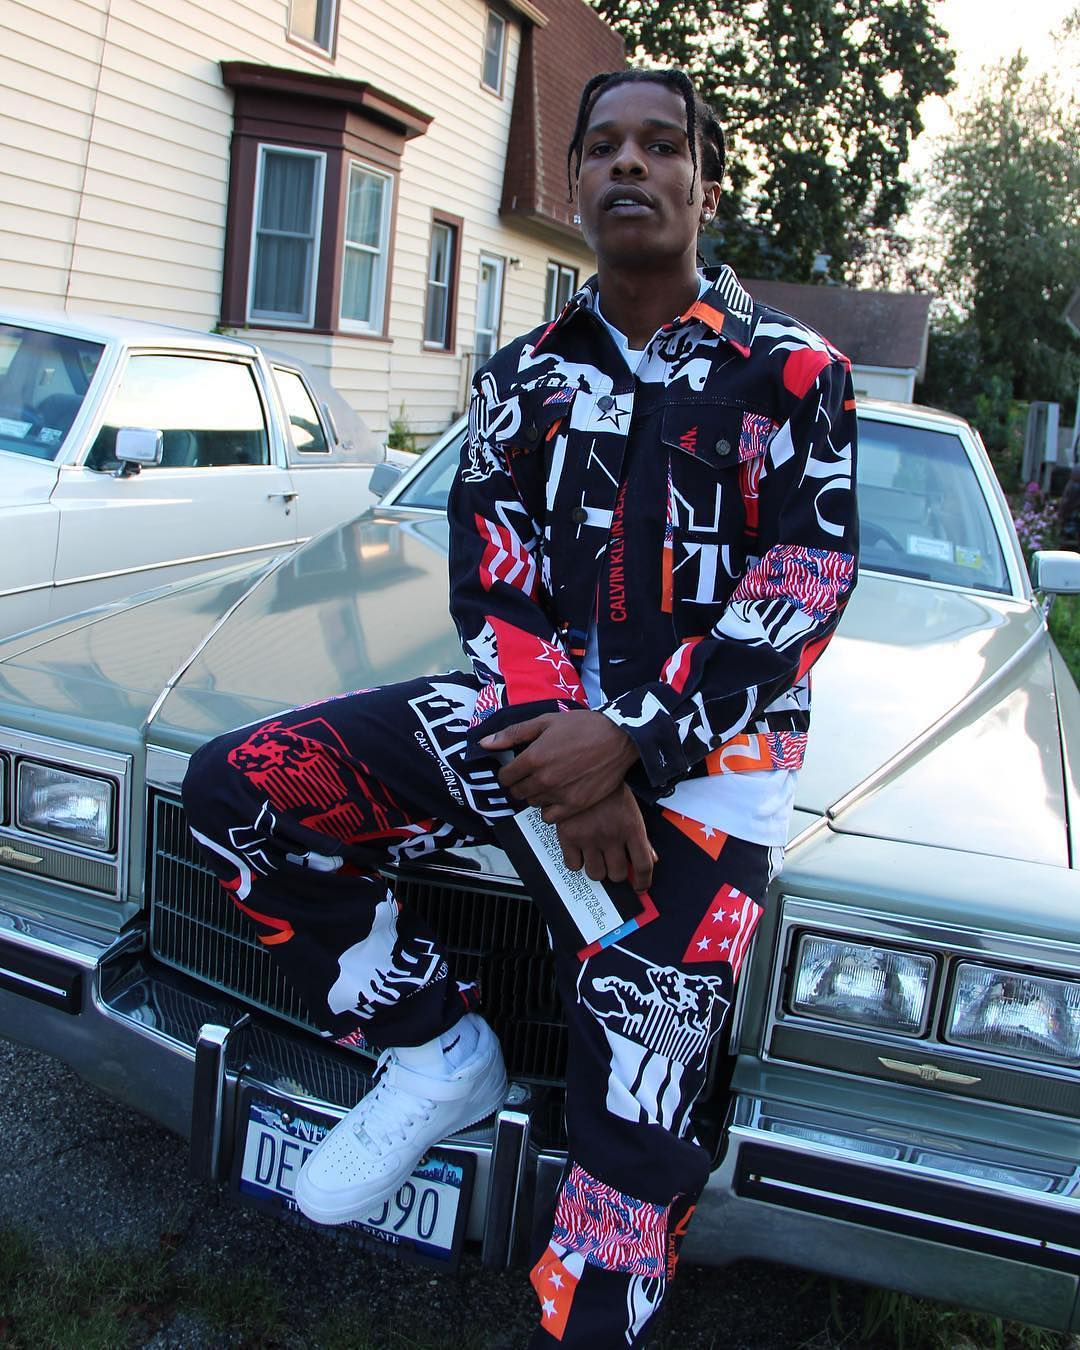 SPOTTED: ASAP Rocky in Calvin Klein Est. 1978 & Nike